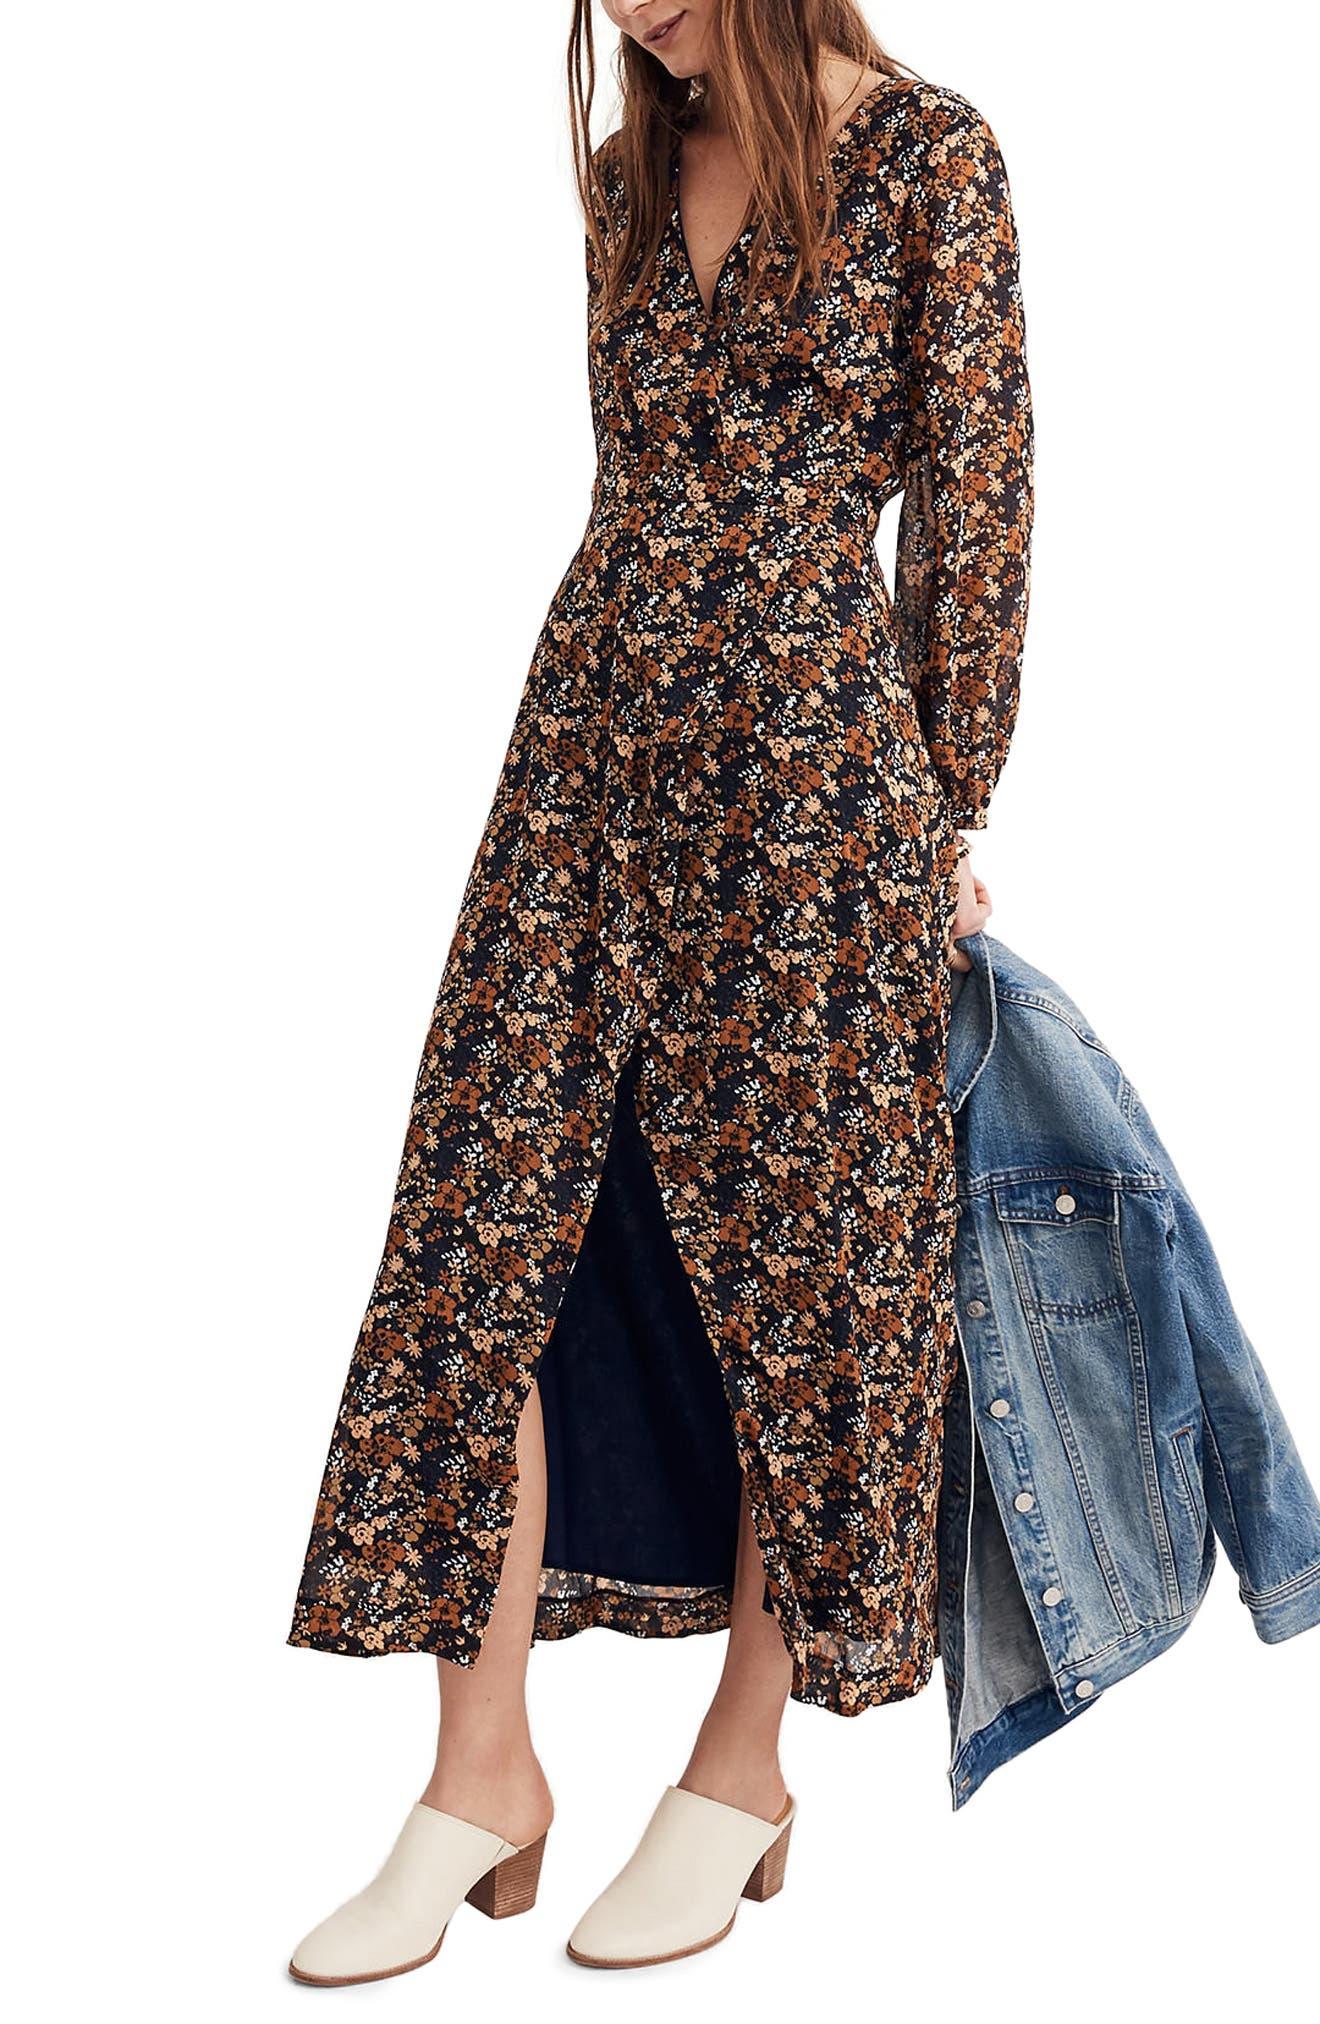 Nightflower Maxi Dress,                         Main,                         color, 200